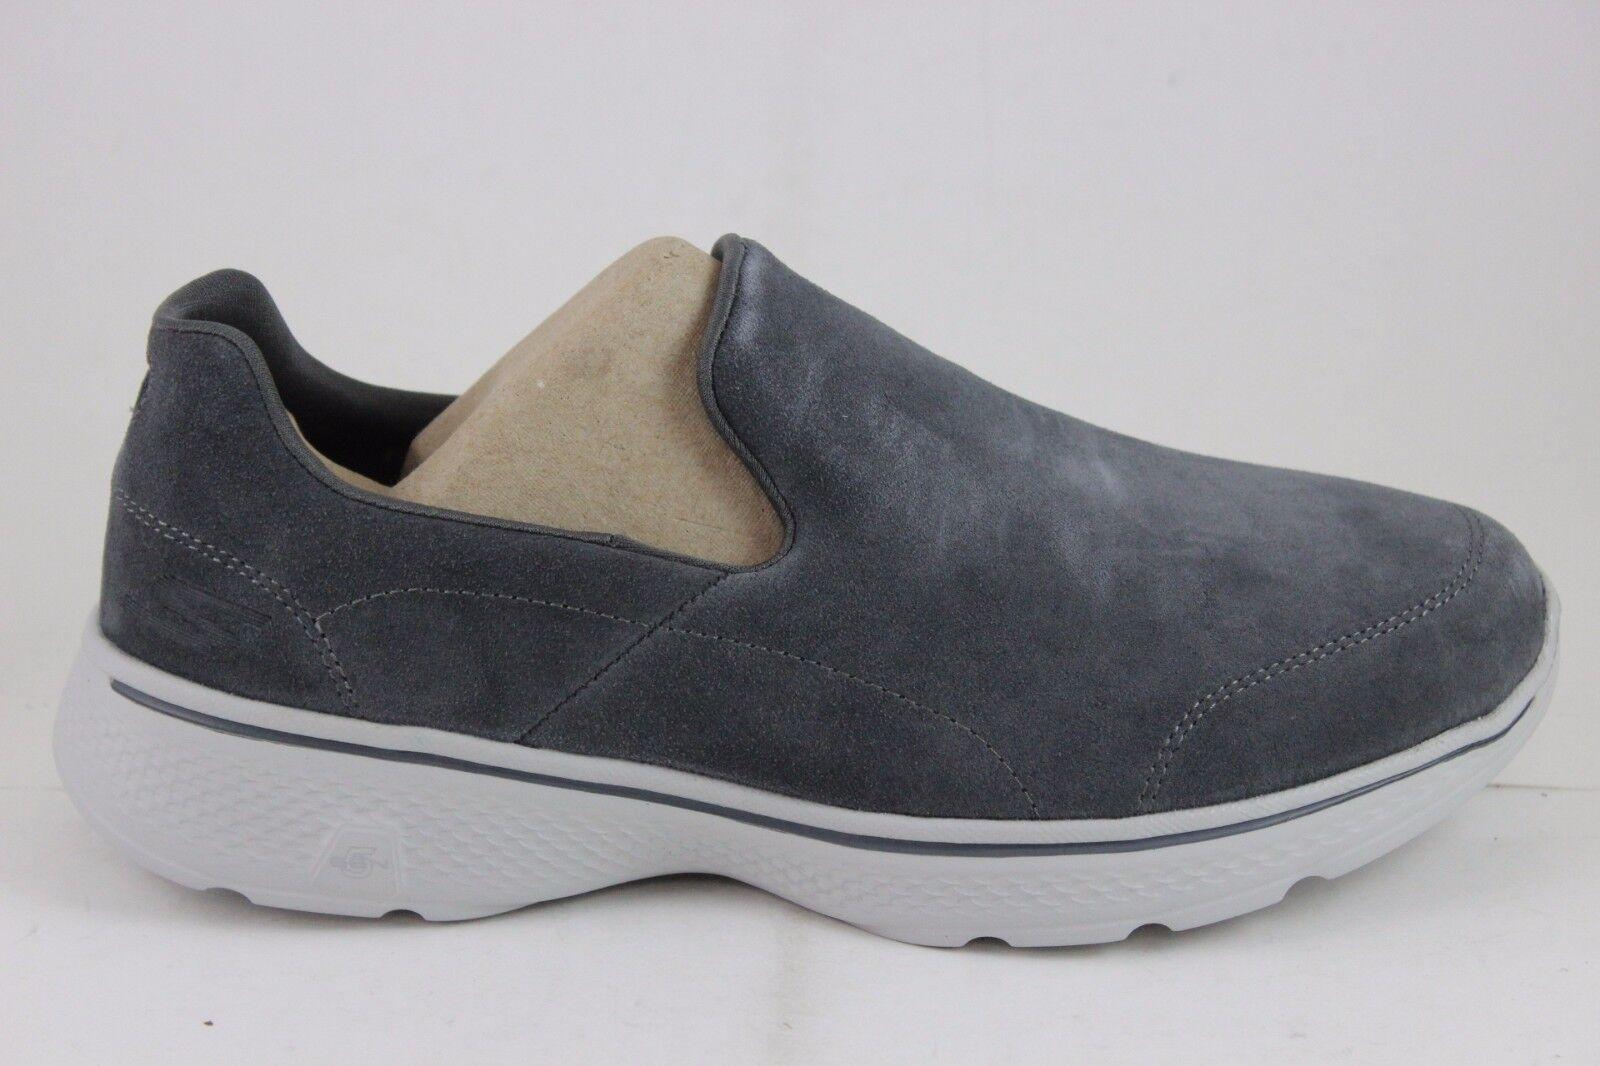 Skechers uomini andare 4-expertise 54166 carbone goga max brand new